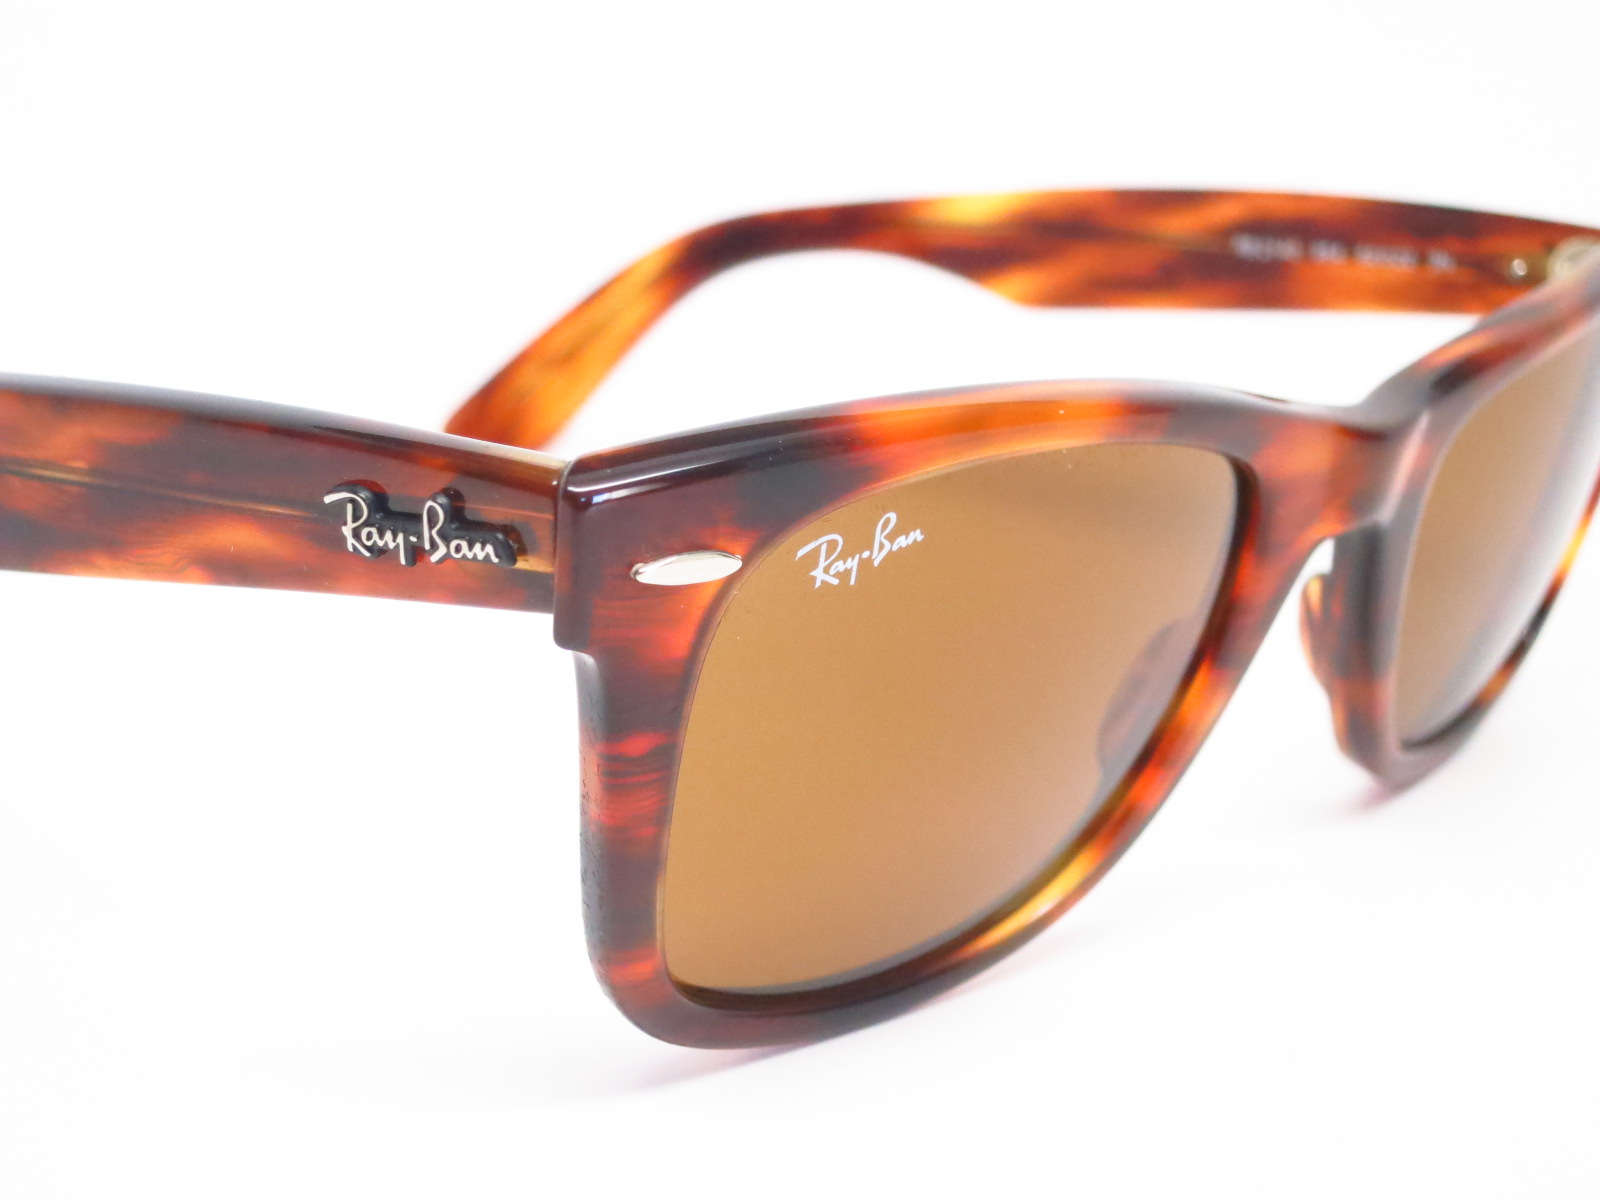 71ee4fc74bb germany ray ban rb 2140 original wayfarer 954 light tortoise sunglasses  98306 f49fa